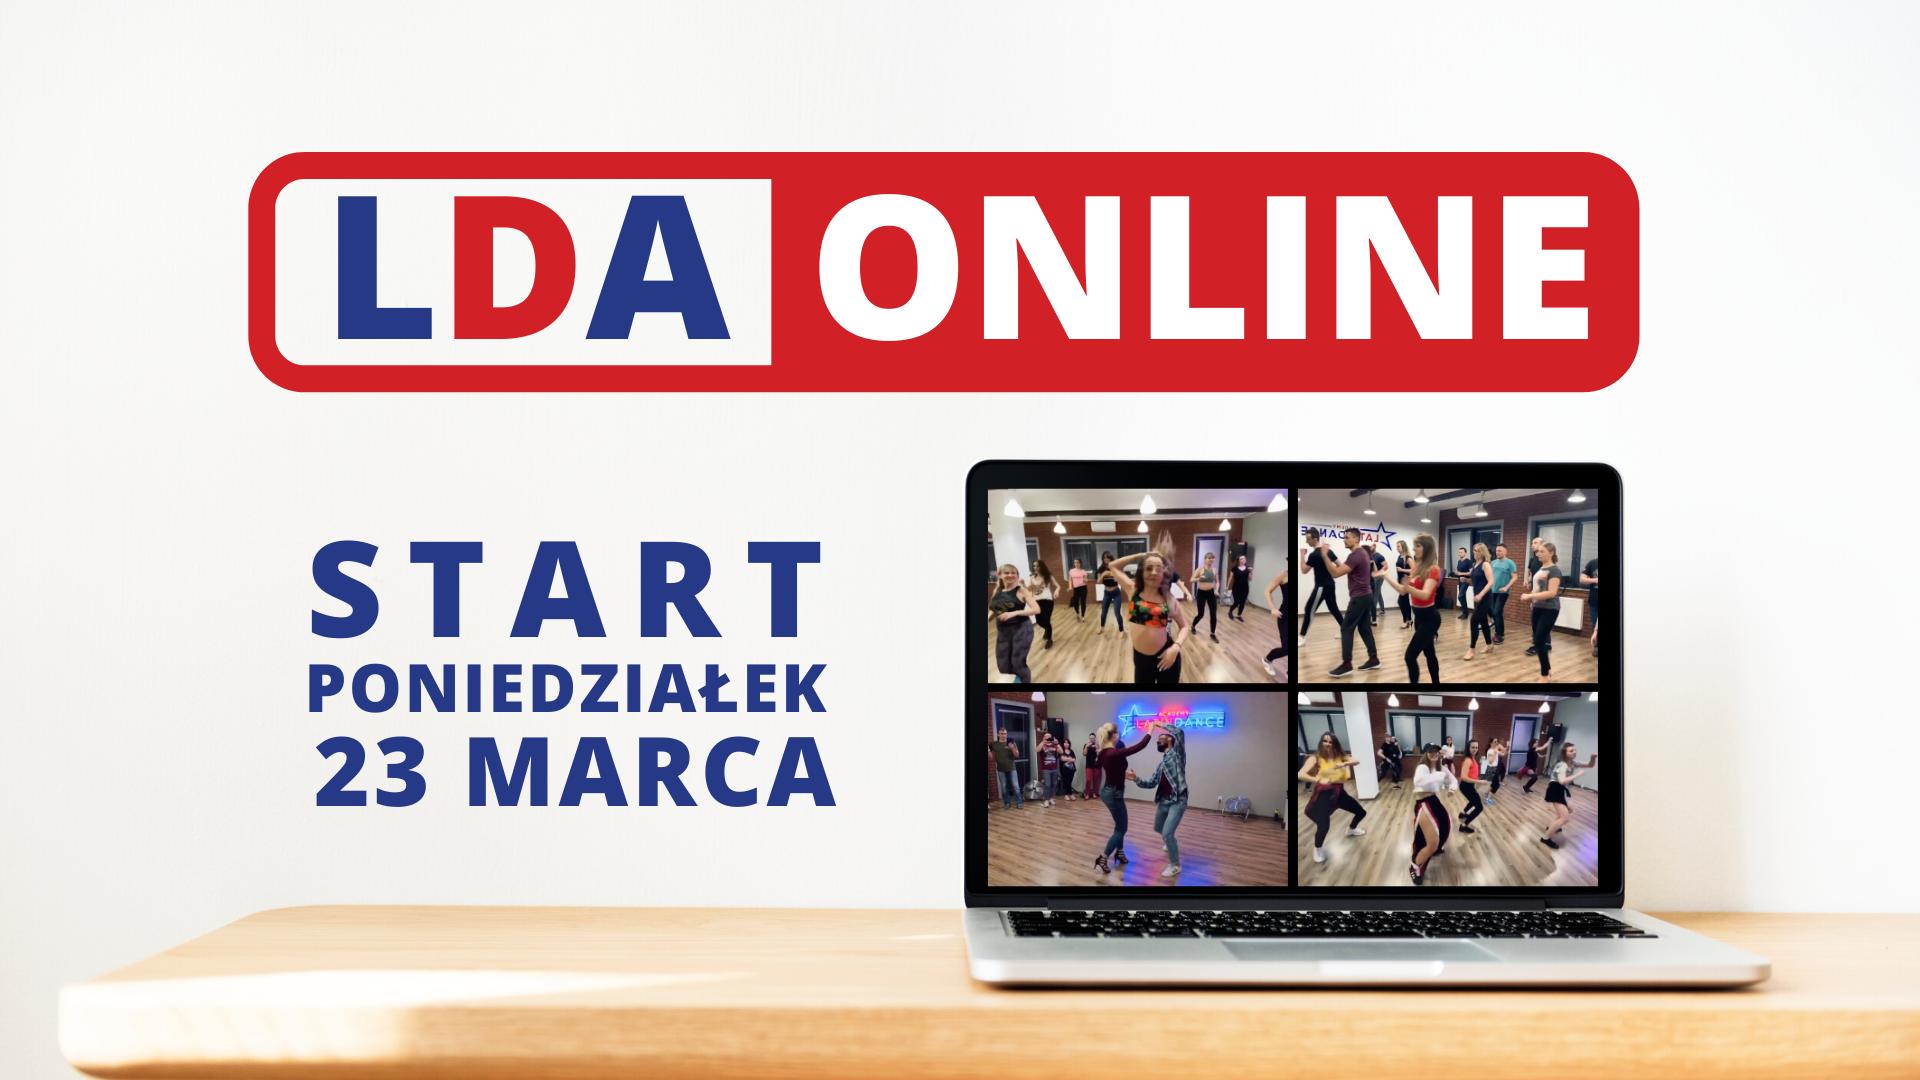 lda-online-lda-szkola-tanca-zajecia